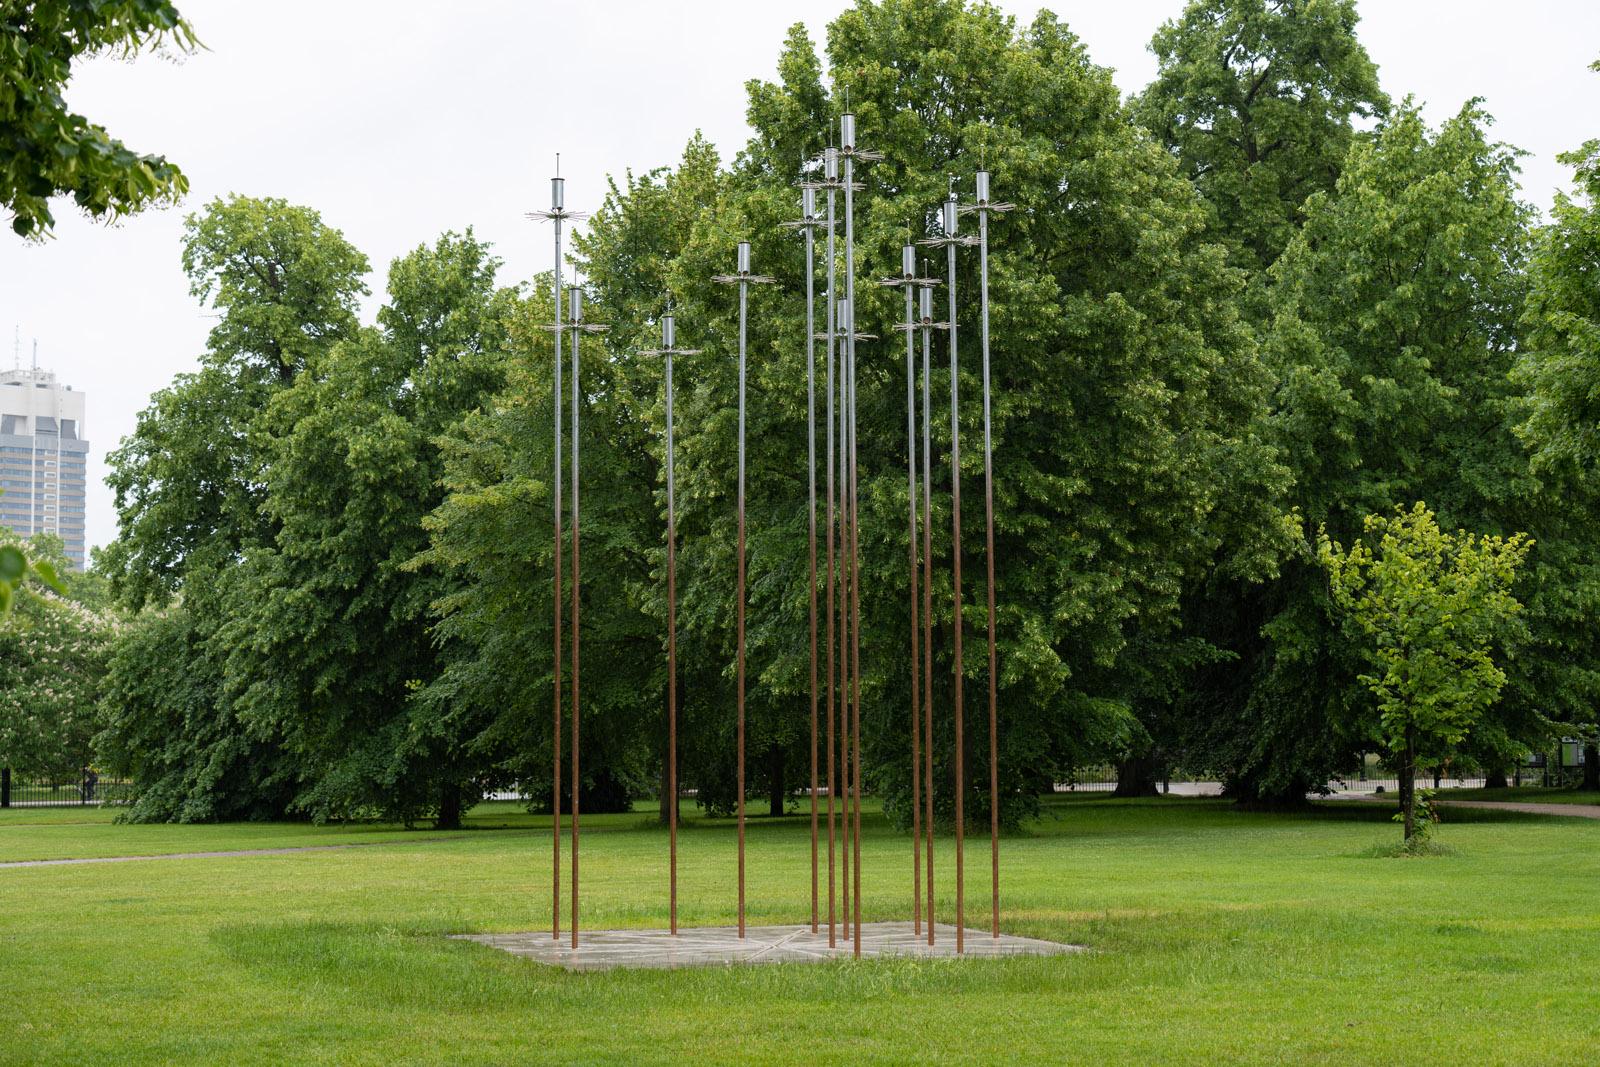 Sophia Al-Maria, taraxos, 2021 Serpentine x Modern Forms Sculpture Commission 21 June 2021 – 24 April 2022 Photo: Hugo Glendinning